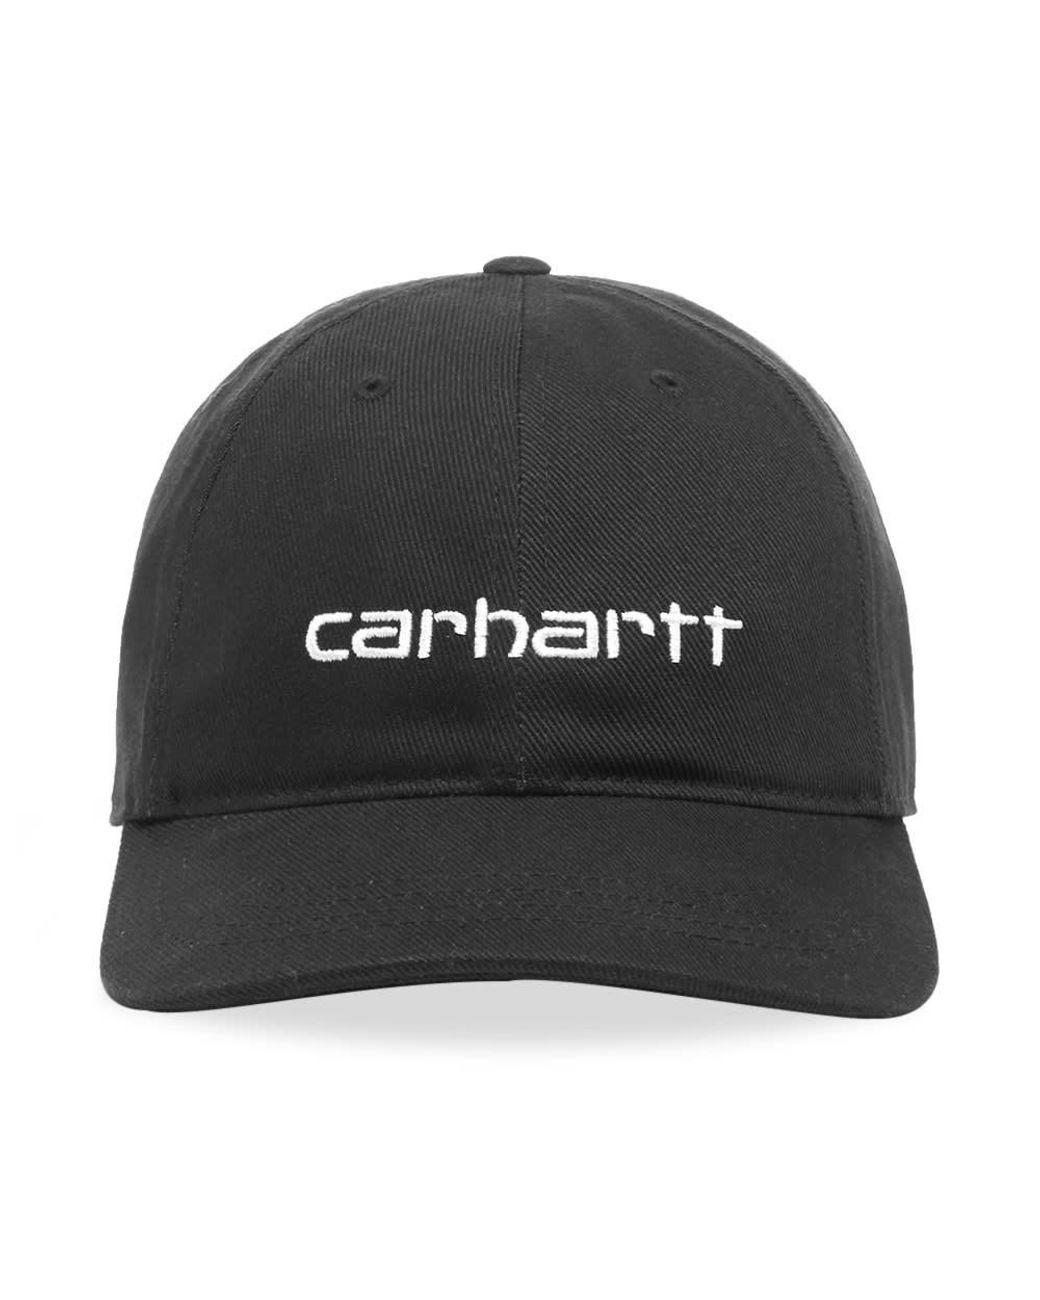 all'ingrosso online stile classico arrivato Carhartt WIP Cotton Carter Cap in Black for Men - Lyst